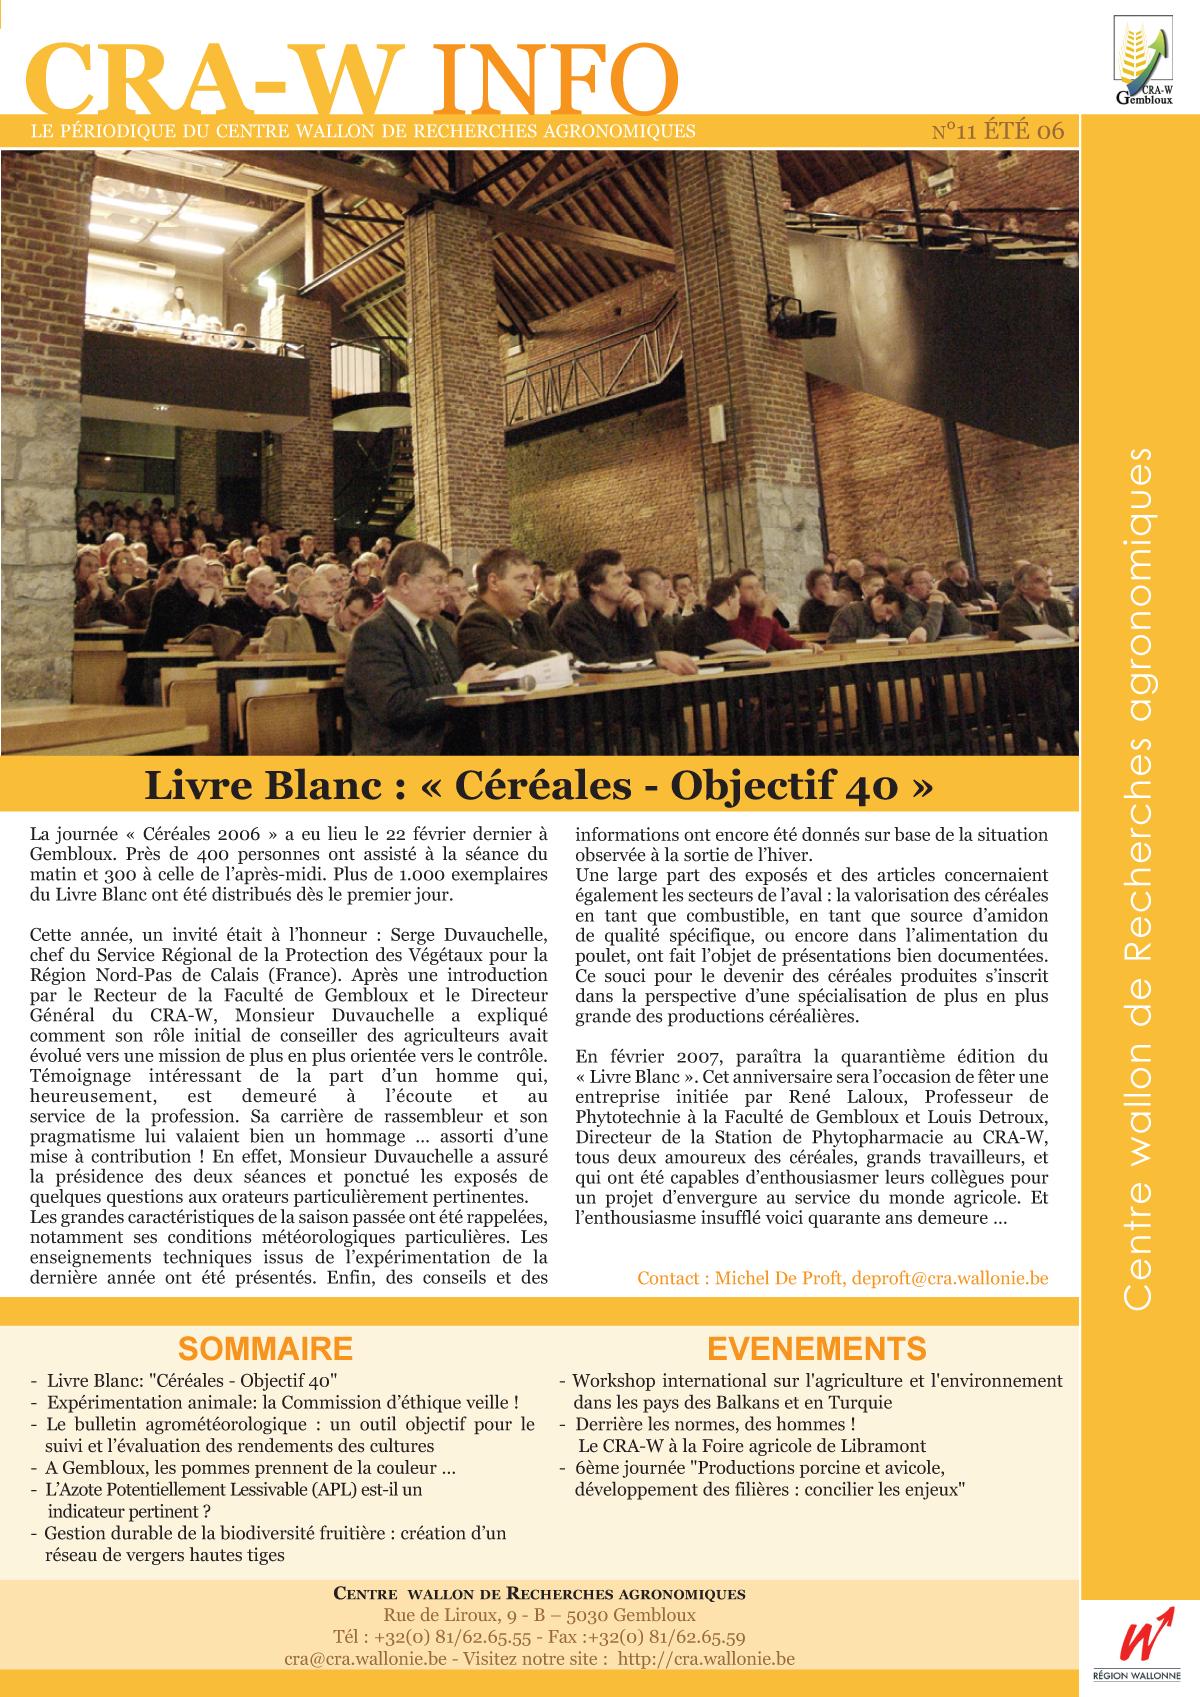 CRAW info n° 11